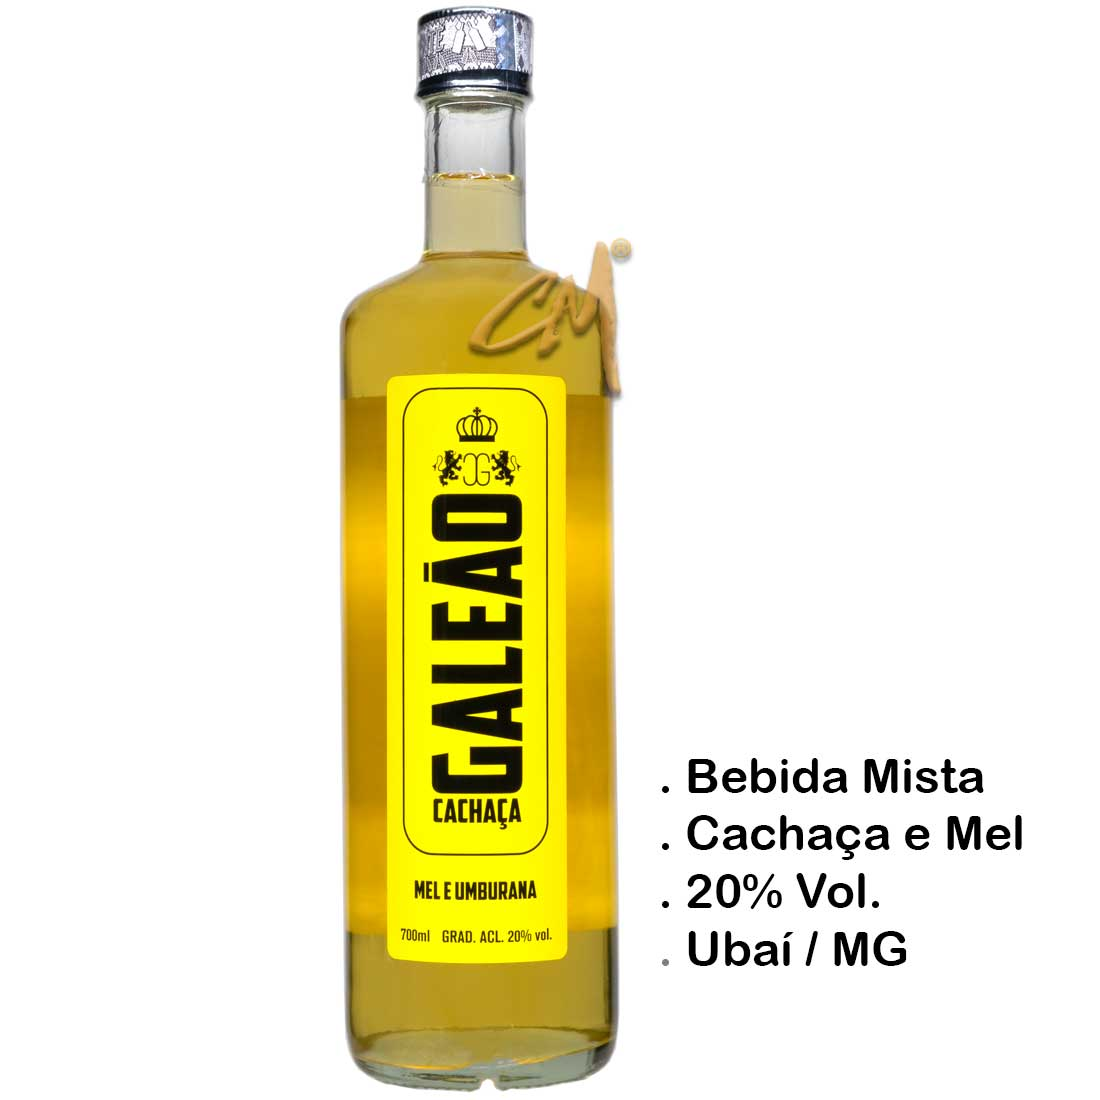 Bebida Mista Galeão - Mel e Amburana - 700 ml (Ubaí-MG)